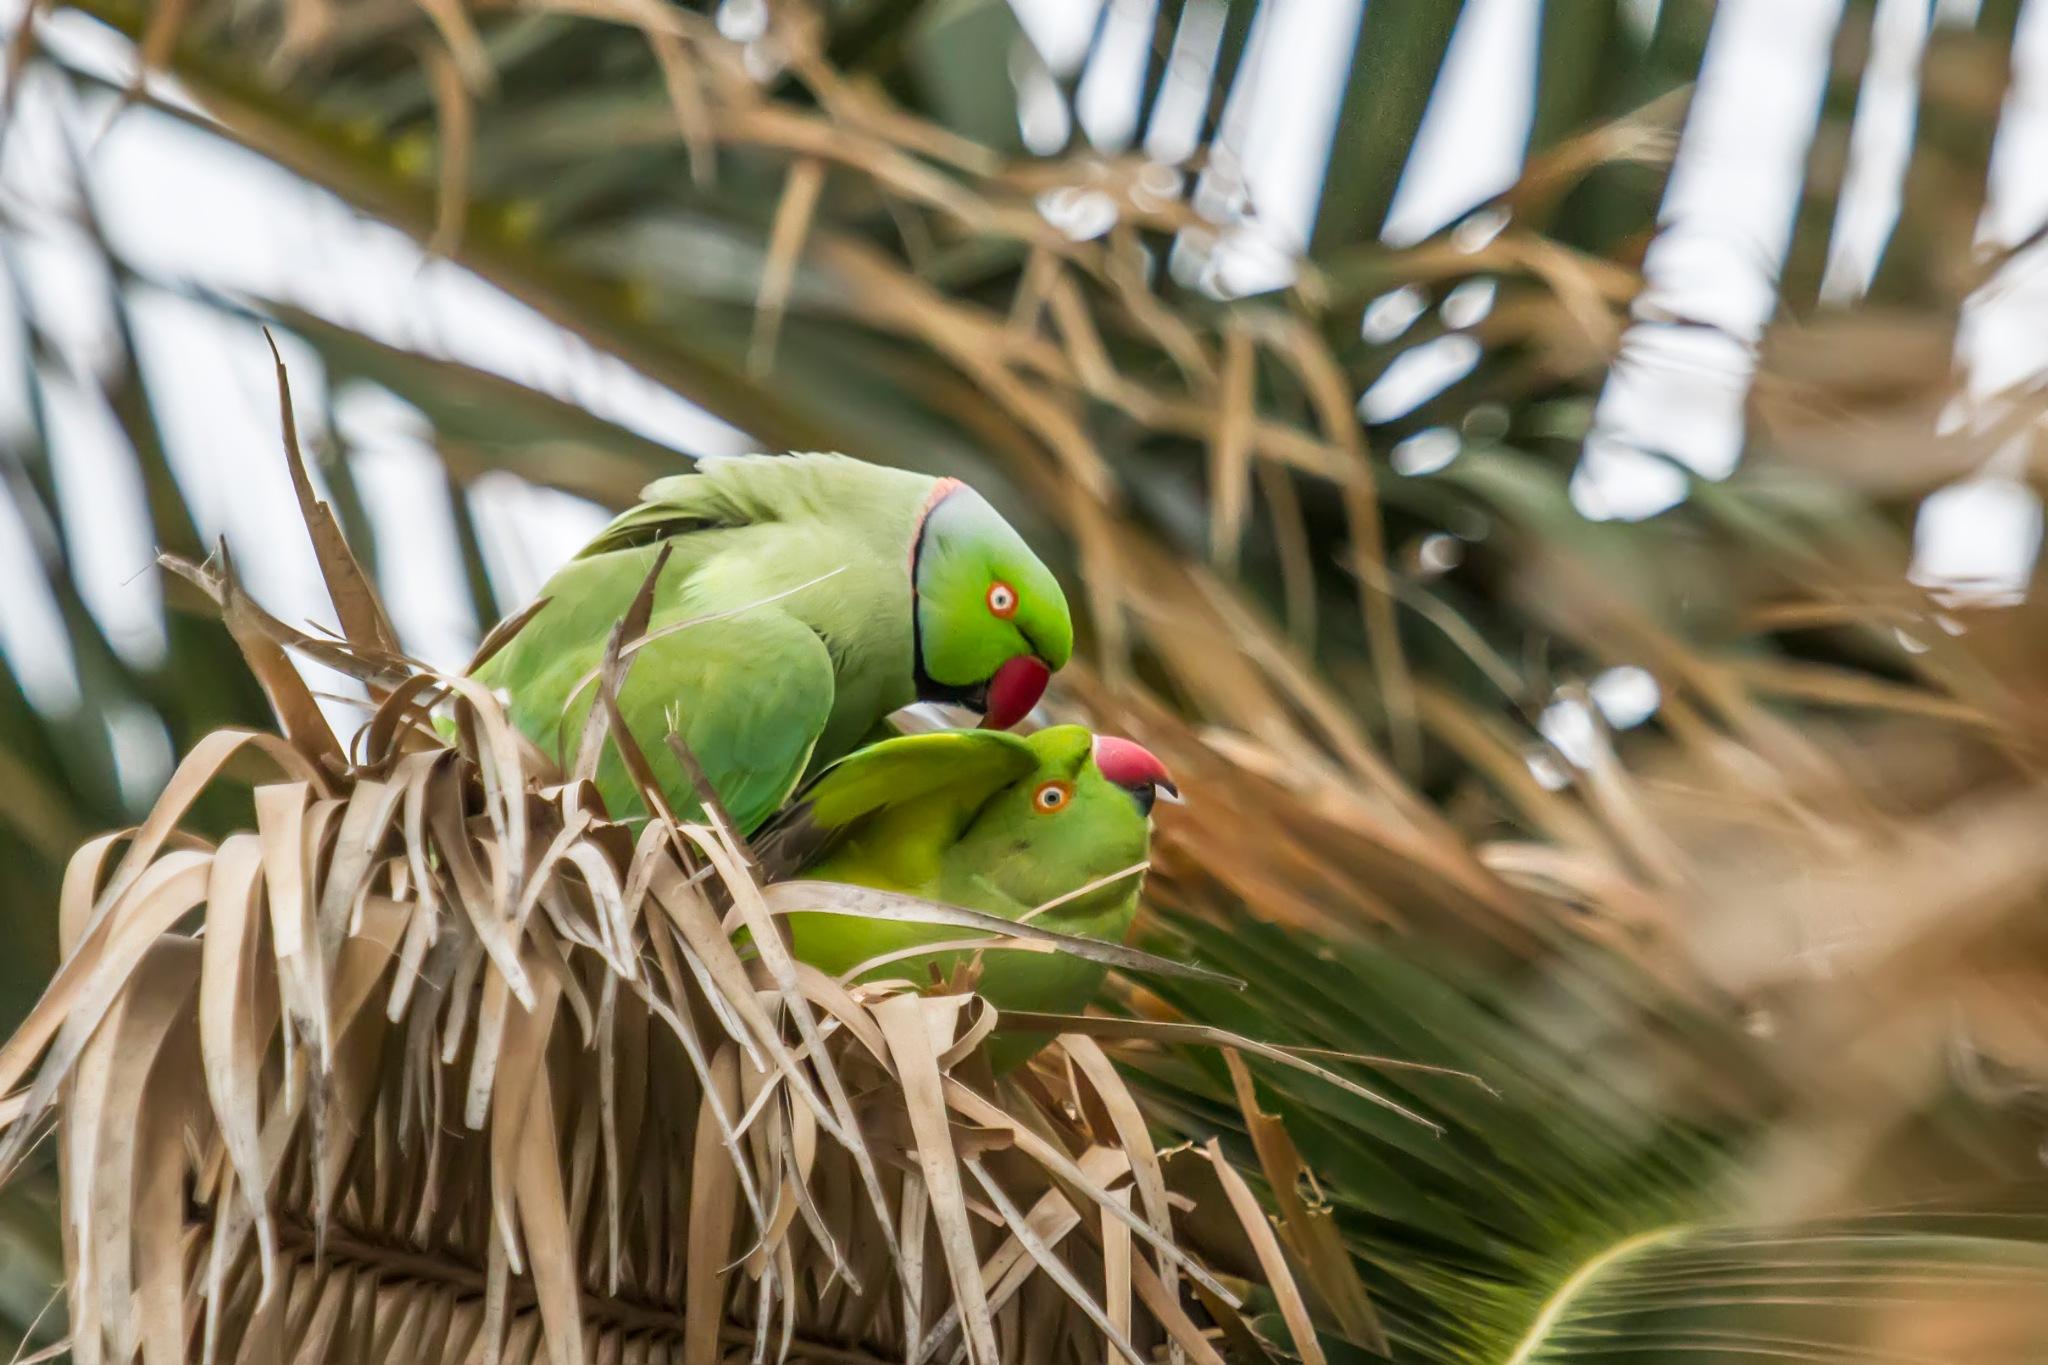 They made love.The rose-ringed parakeet (Psittacula krameri). by sarvikpytt